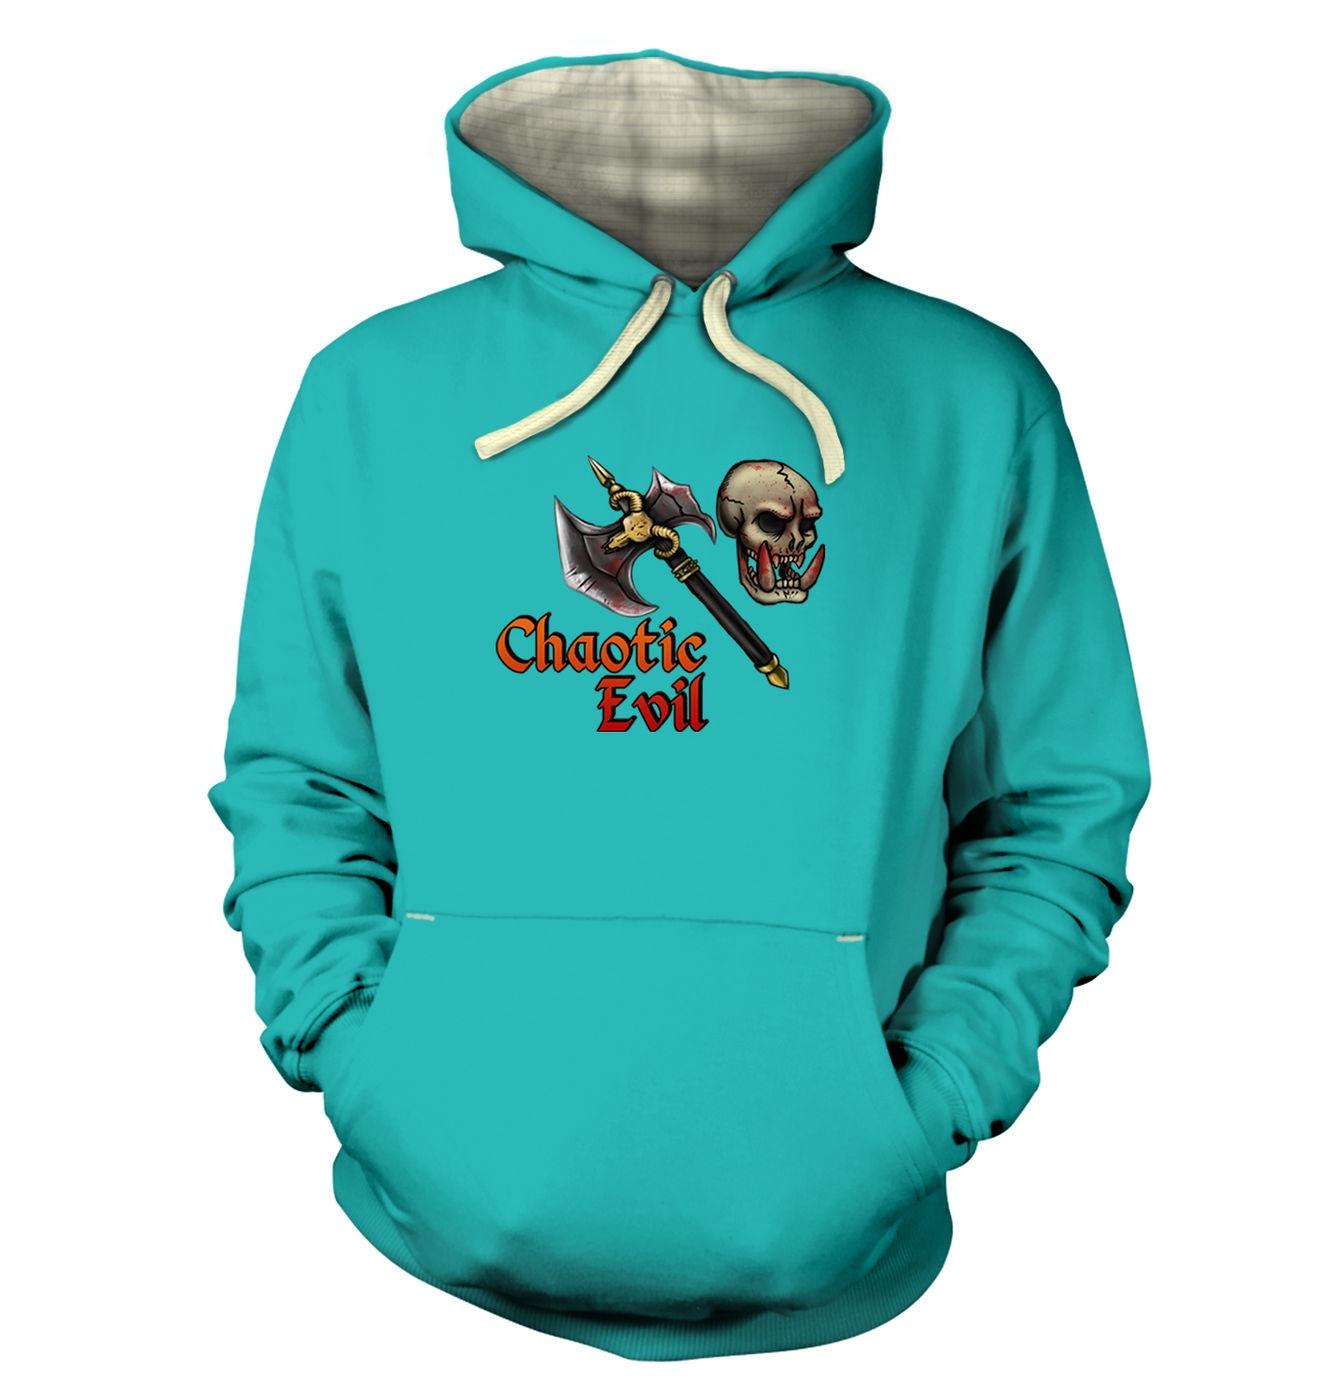 Cartoon Alignment Chaotic Evil - premium gaming hoodies